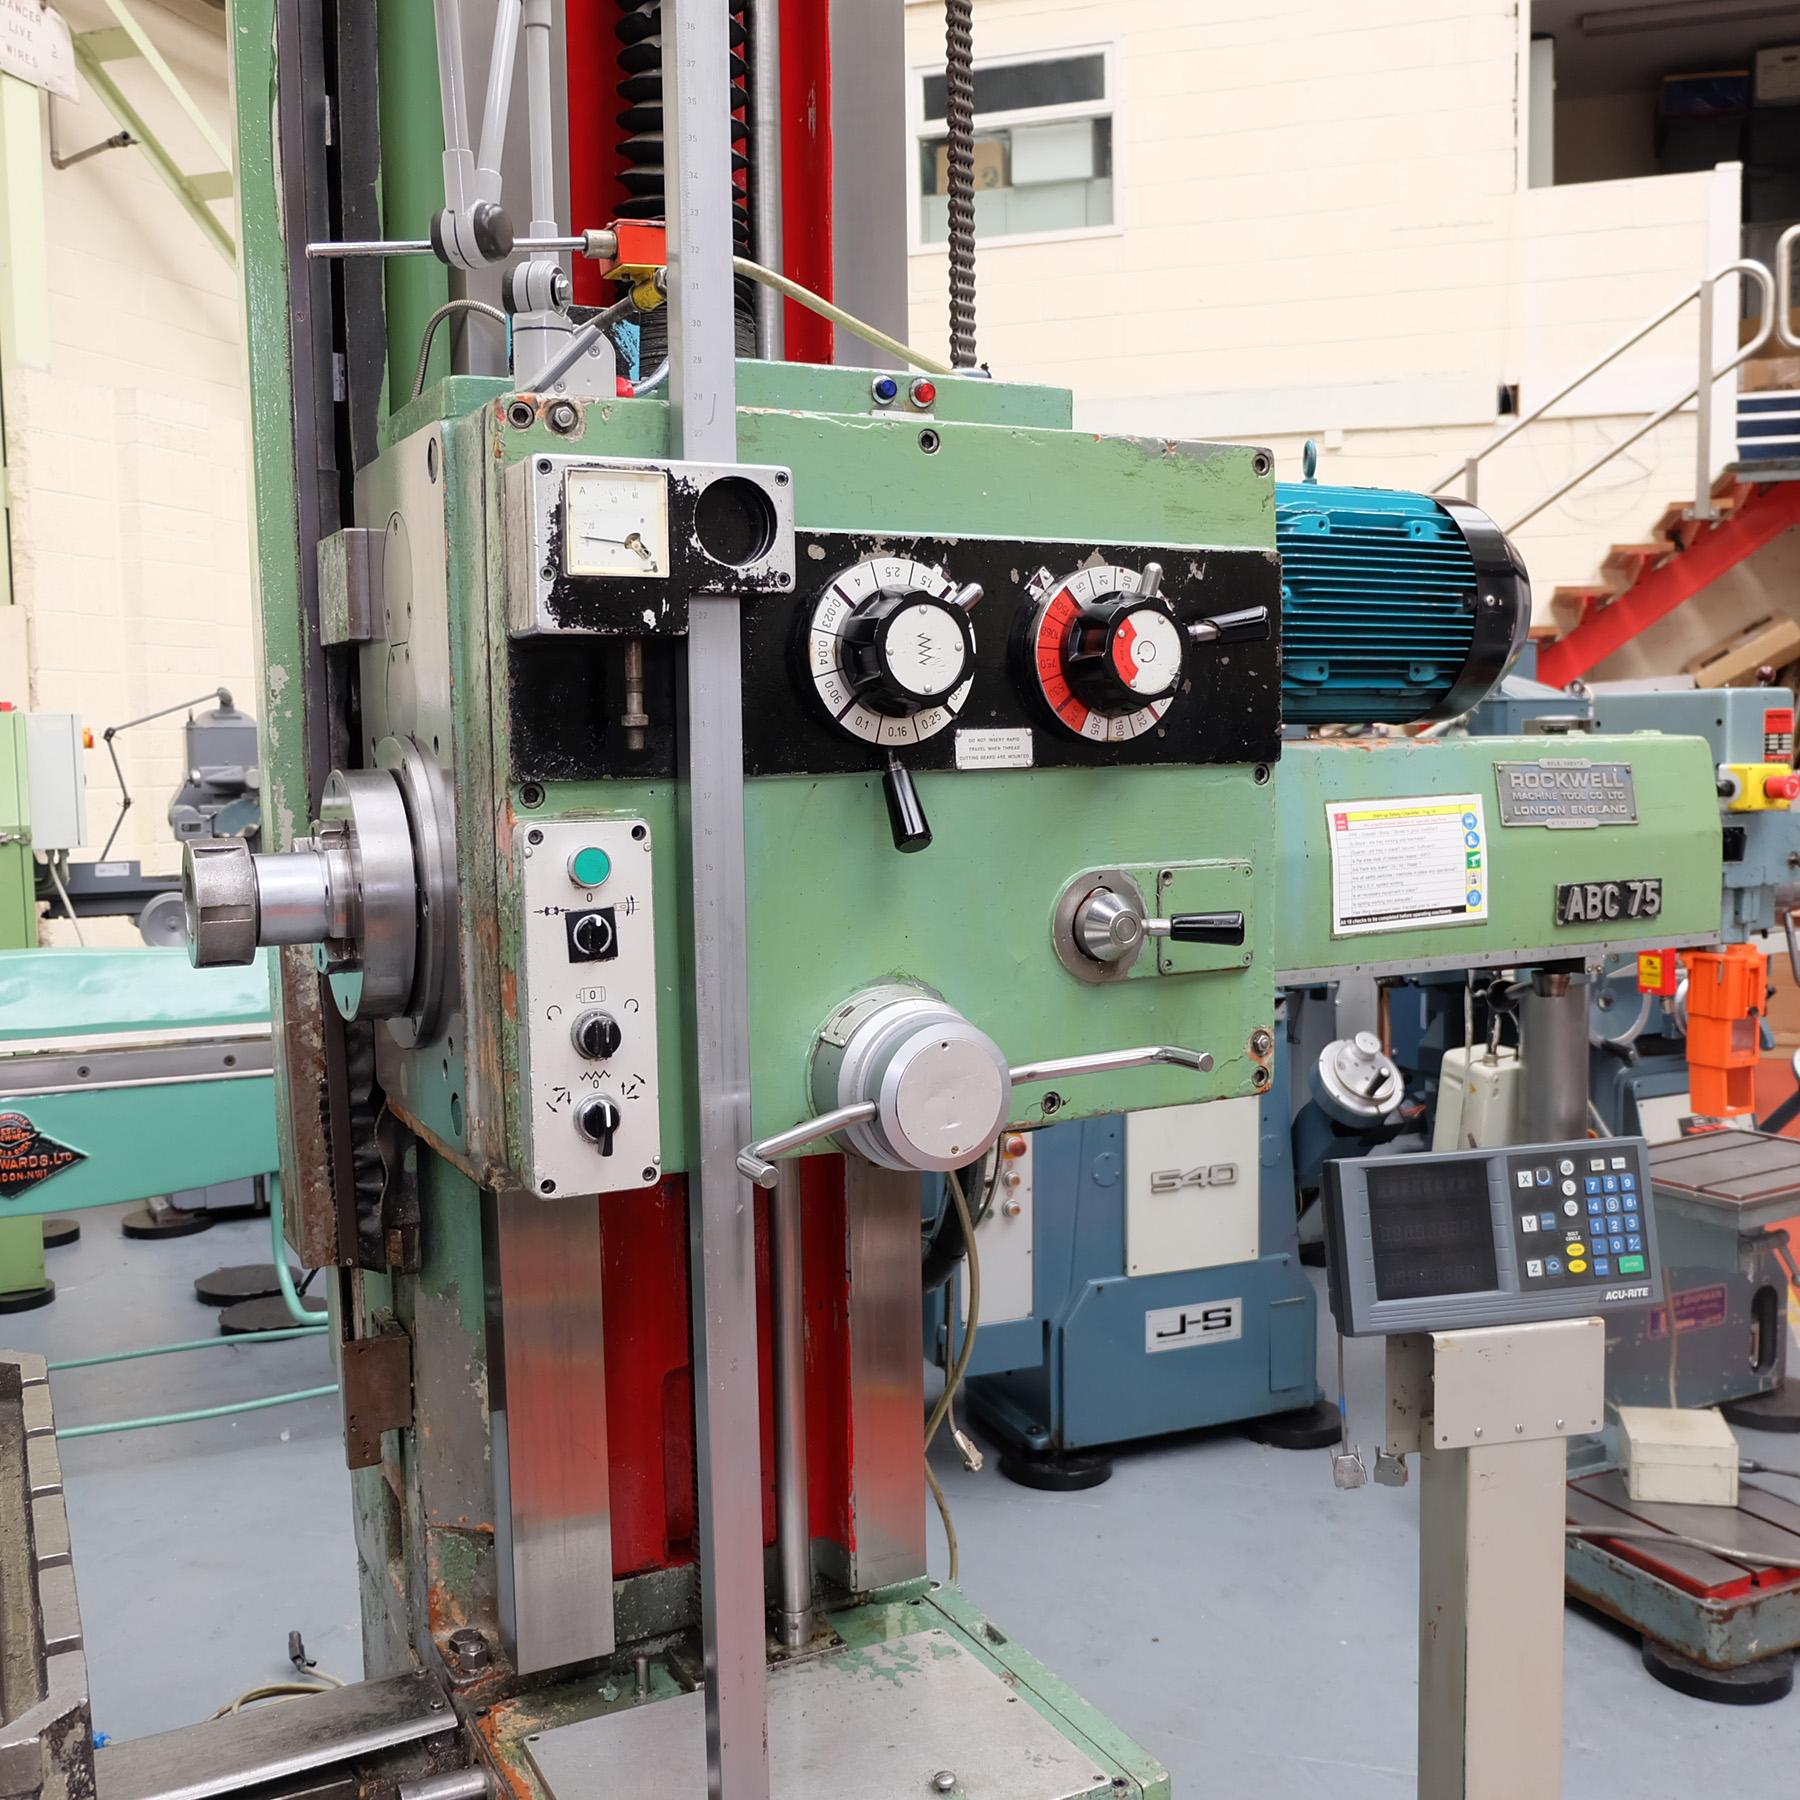 Ceruti Model ABC 75 Horizontal Boring & Milling Machine. With Tooling. - Image 8 of 15